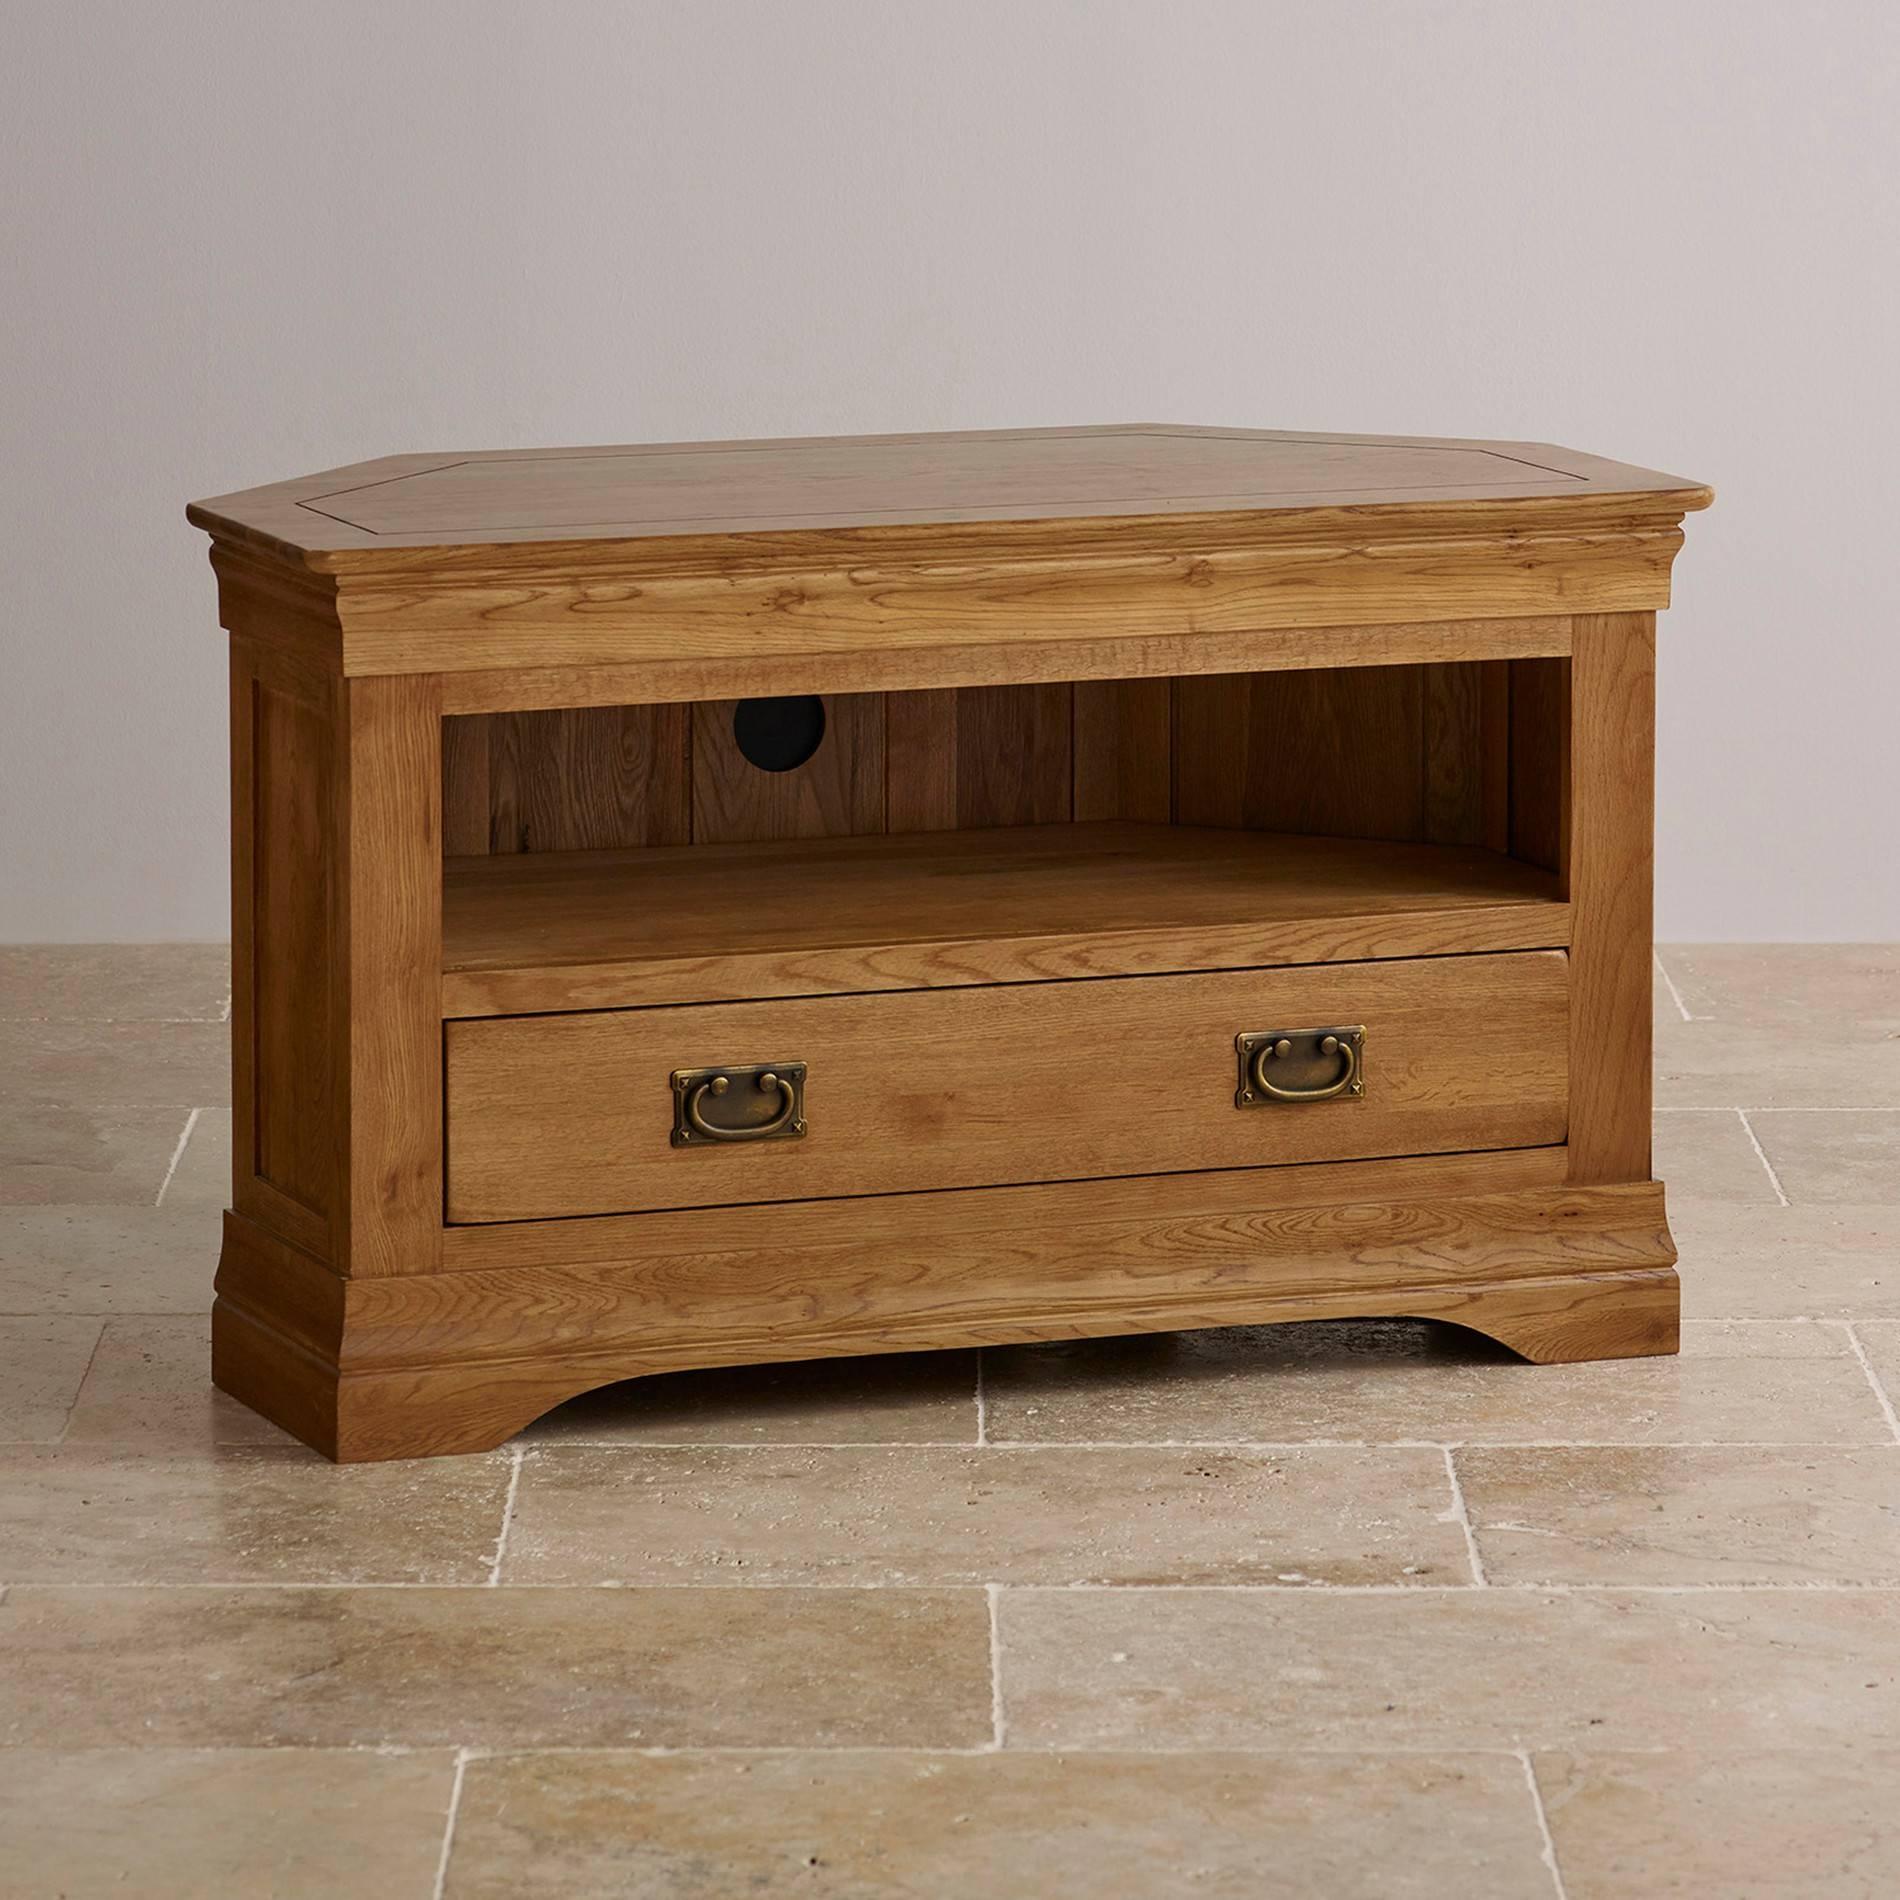 French Farmhouse Corner Tv Unit | Solid Oak | Oak Furniture Land regarding Oak Corner Tv Cabinets (Image 4 of 15)